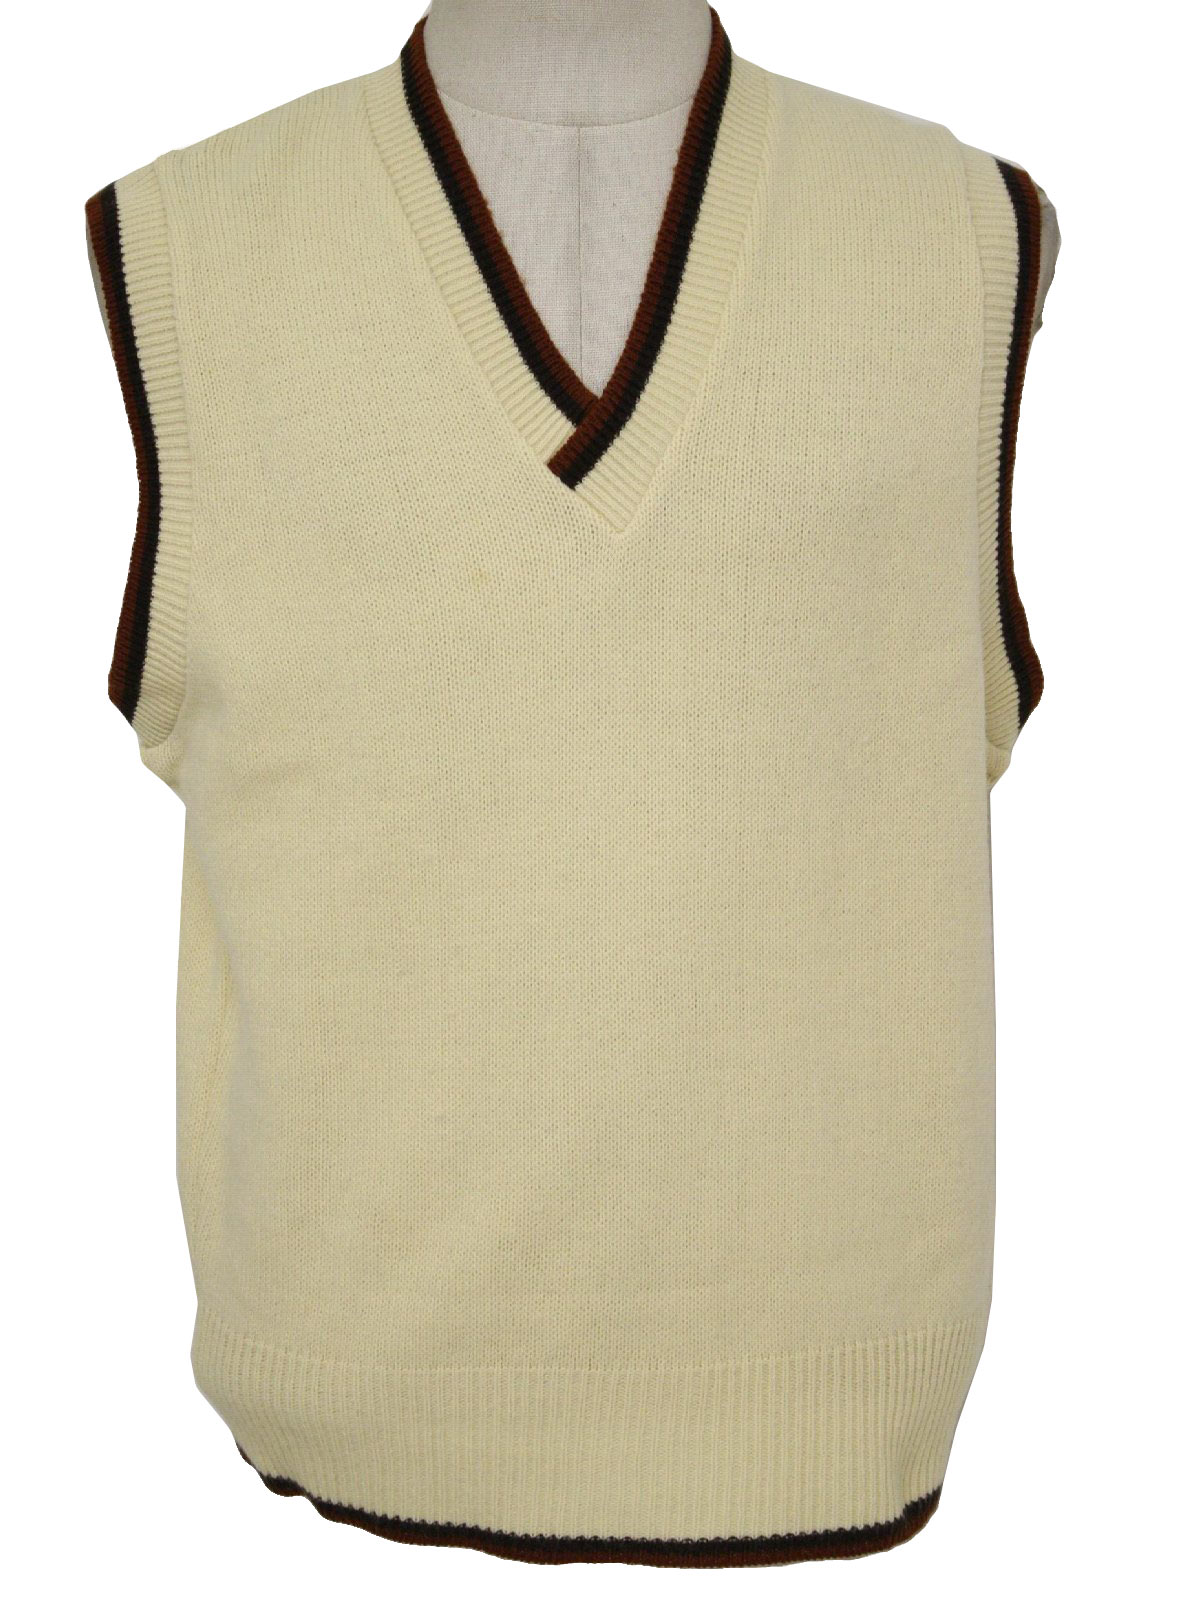 Retro 1970s Sweater: 70s -Sears Kings Road- Mens cream, brown ...